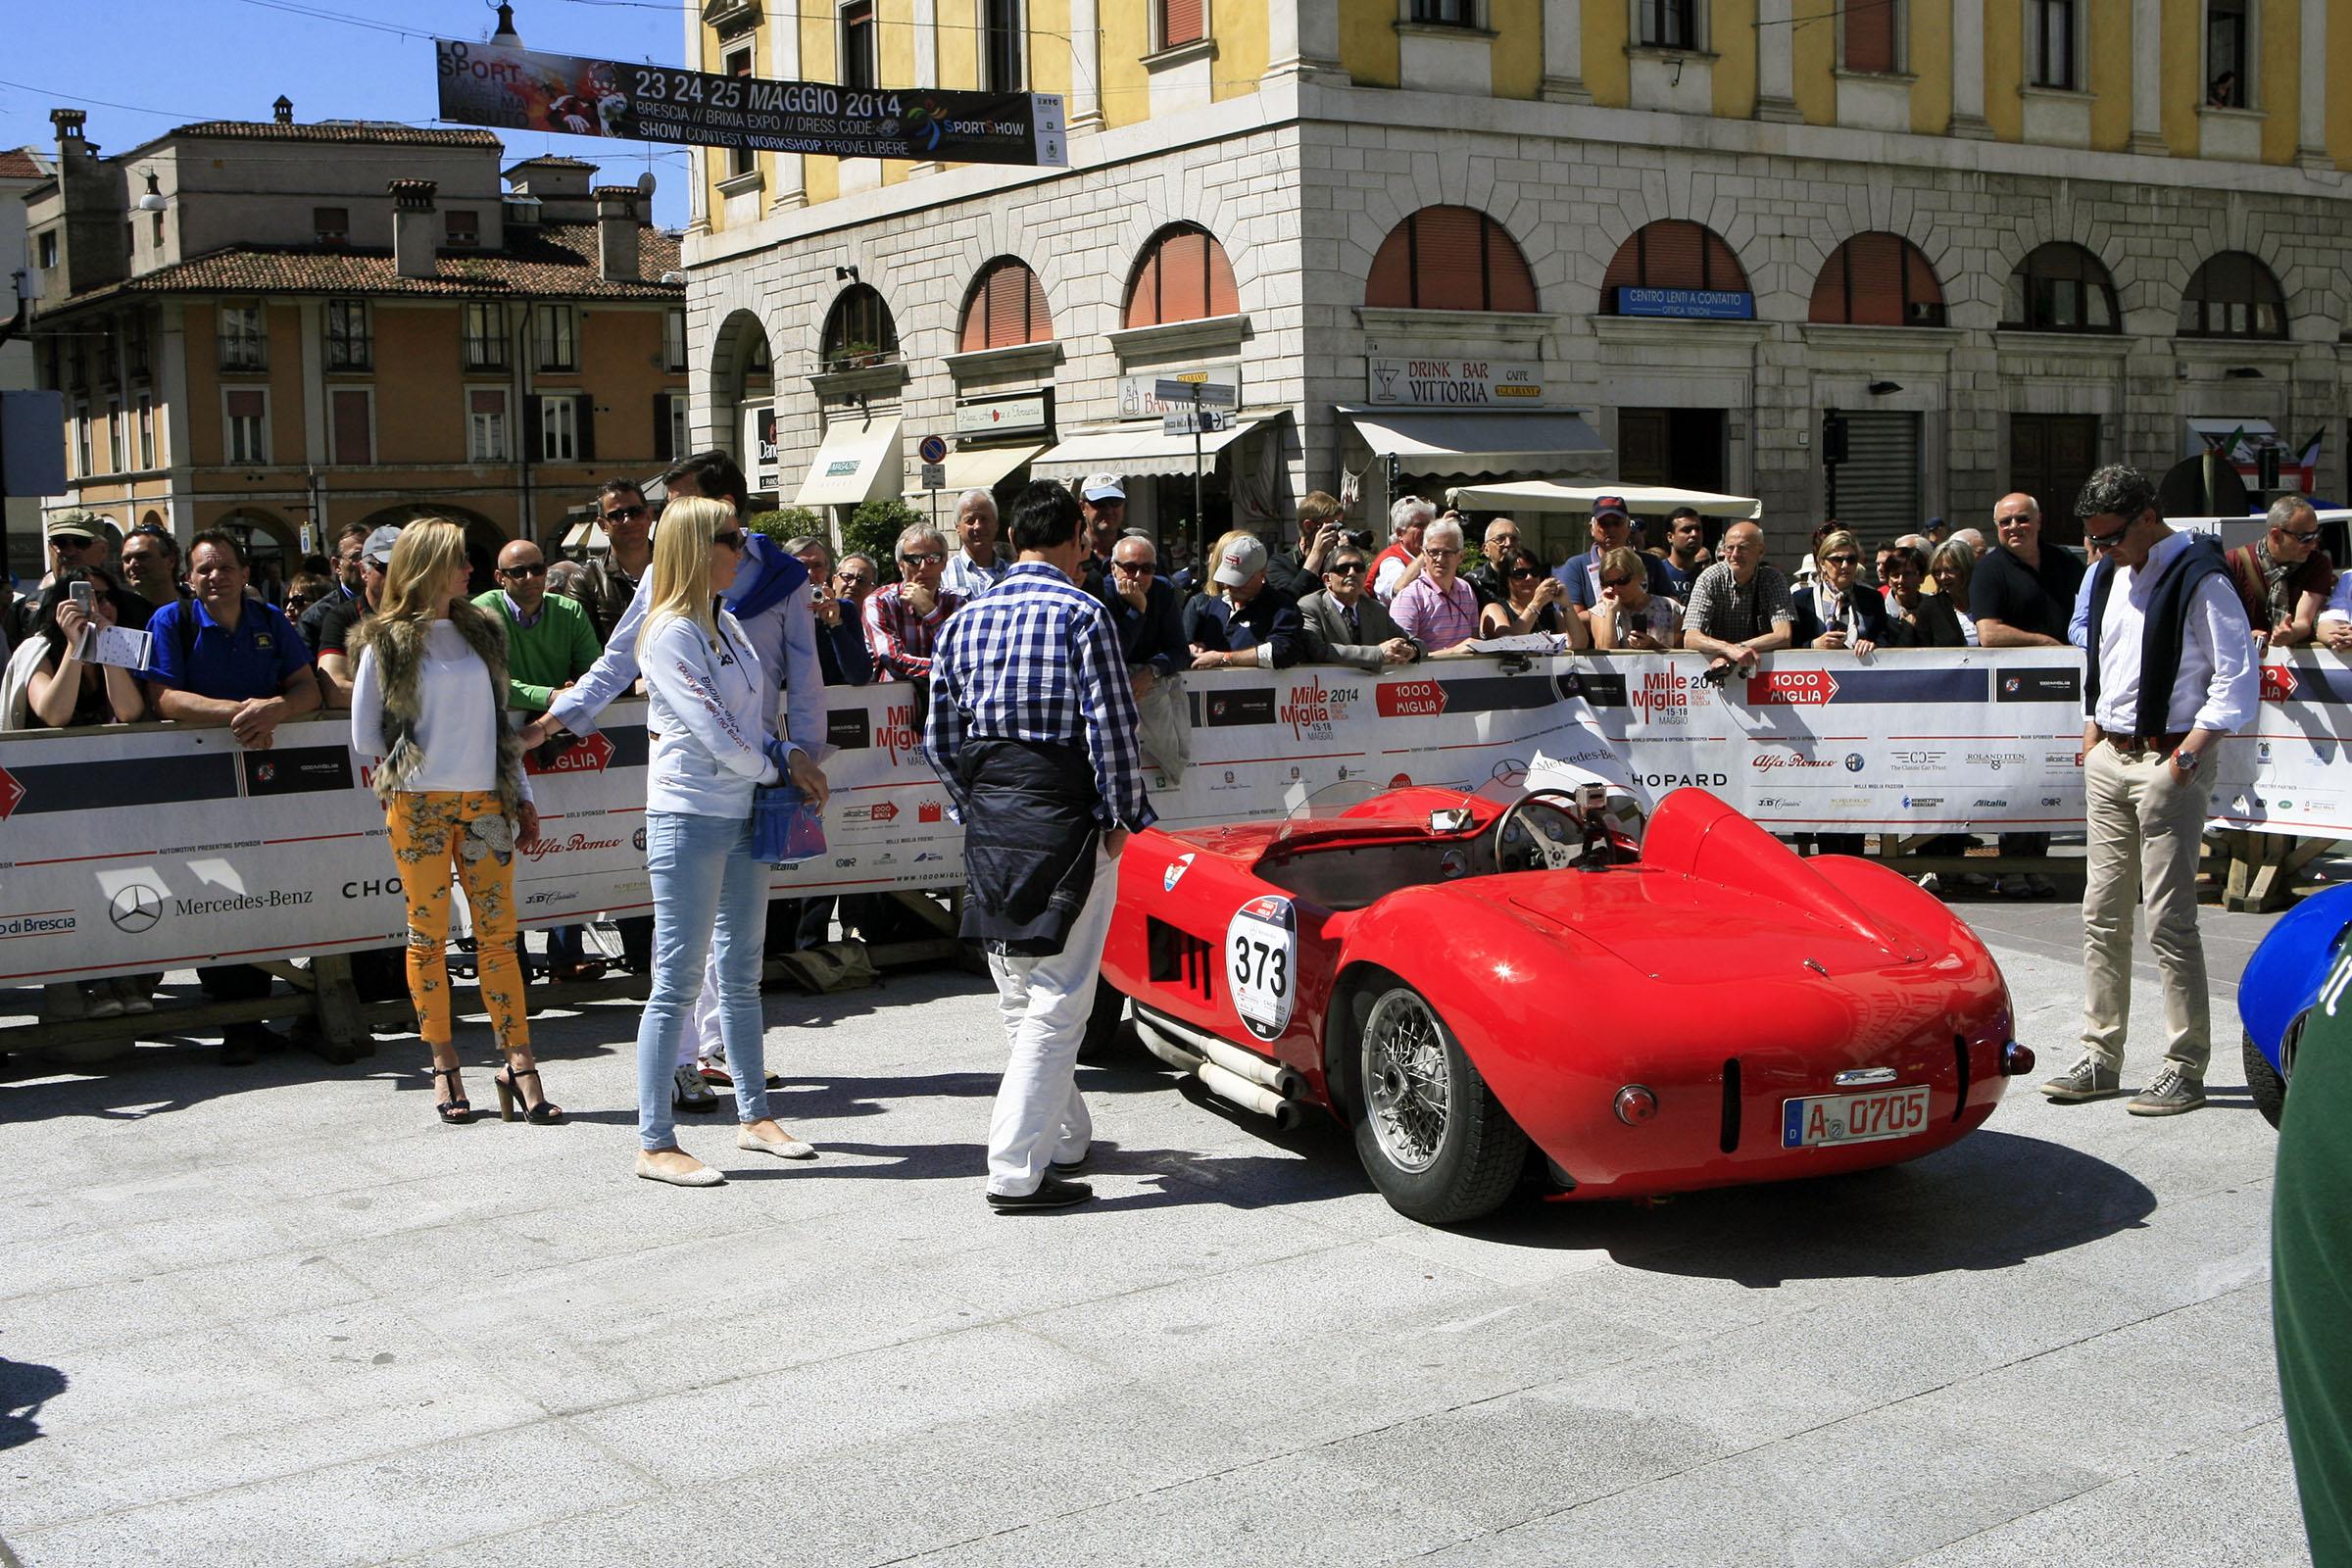 373 - ROSCHMANN Dieter (D) + RUGGERI Vito (D) - Maserati 300 S spider Fantuzzi 19550